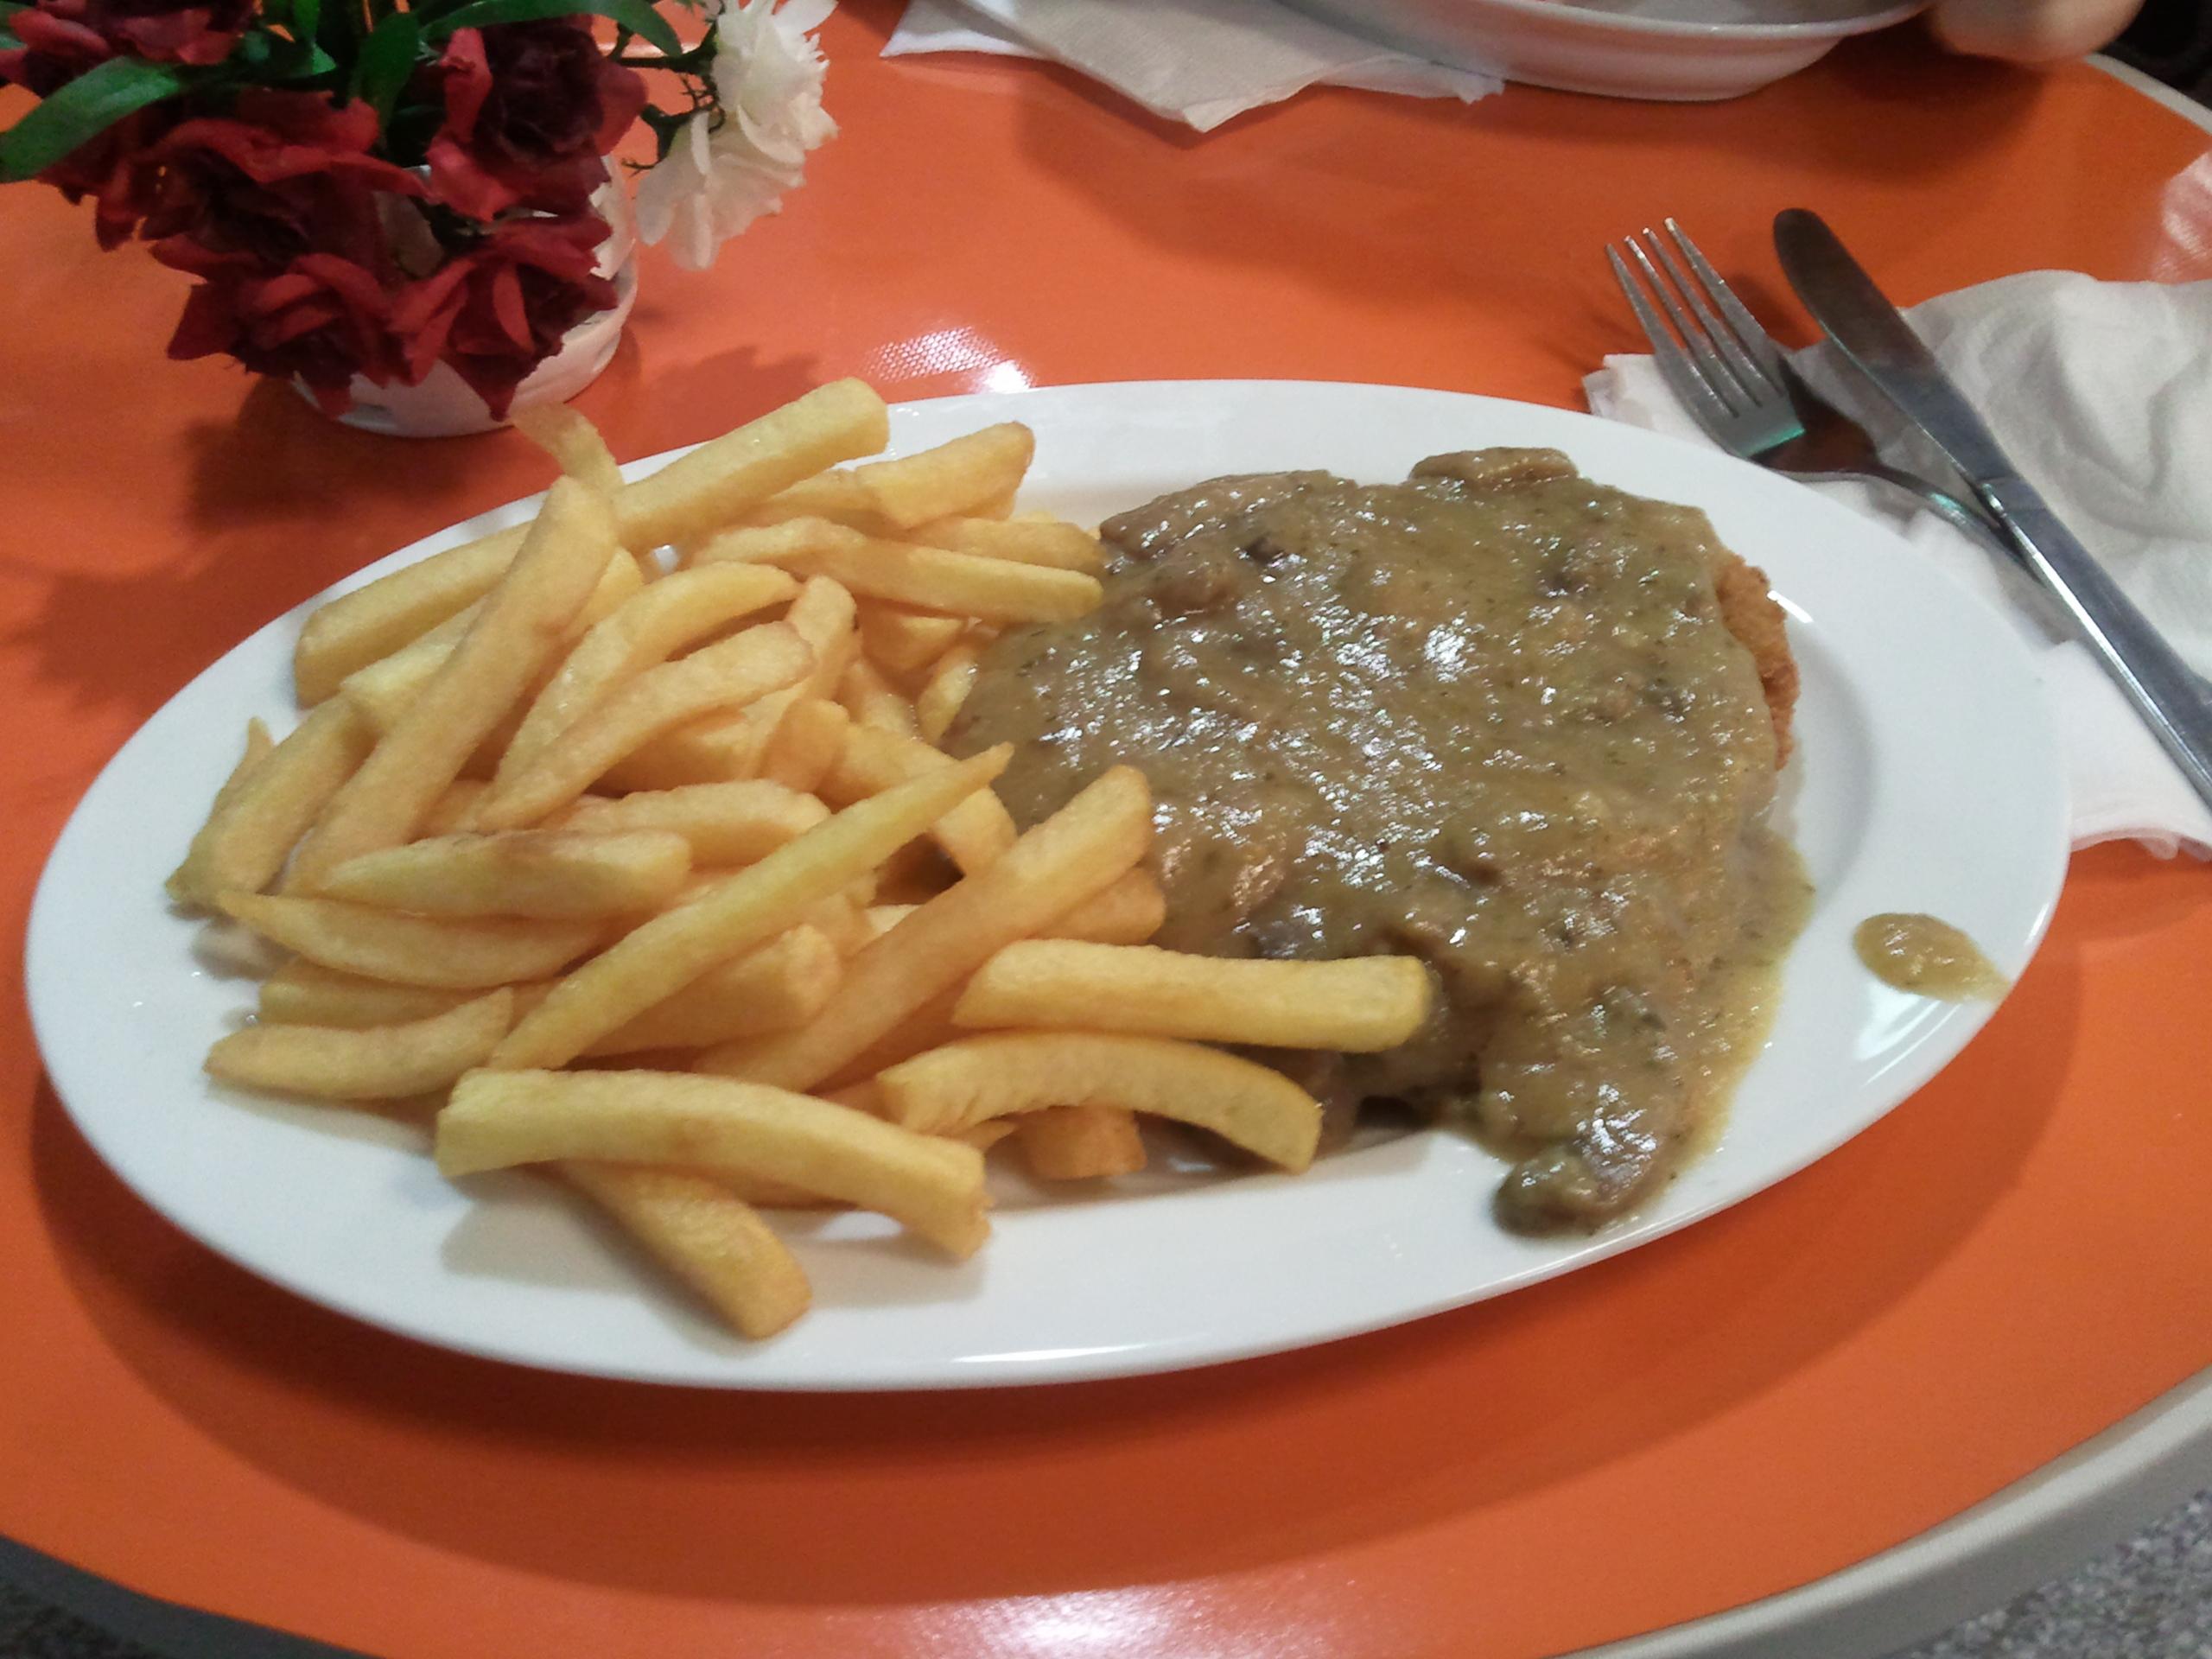 http://foodloader.net/Timber_2013-01-04_Schnitzel_mit_Pommes.jpg